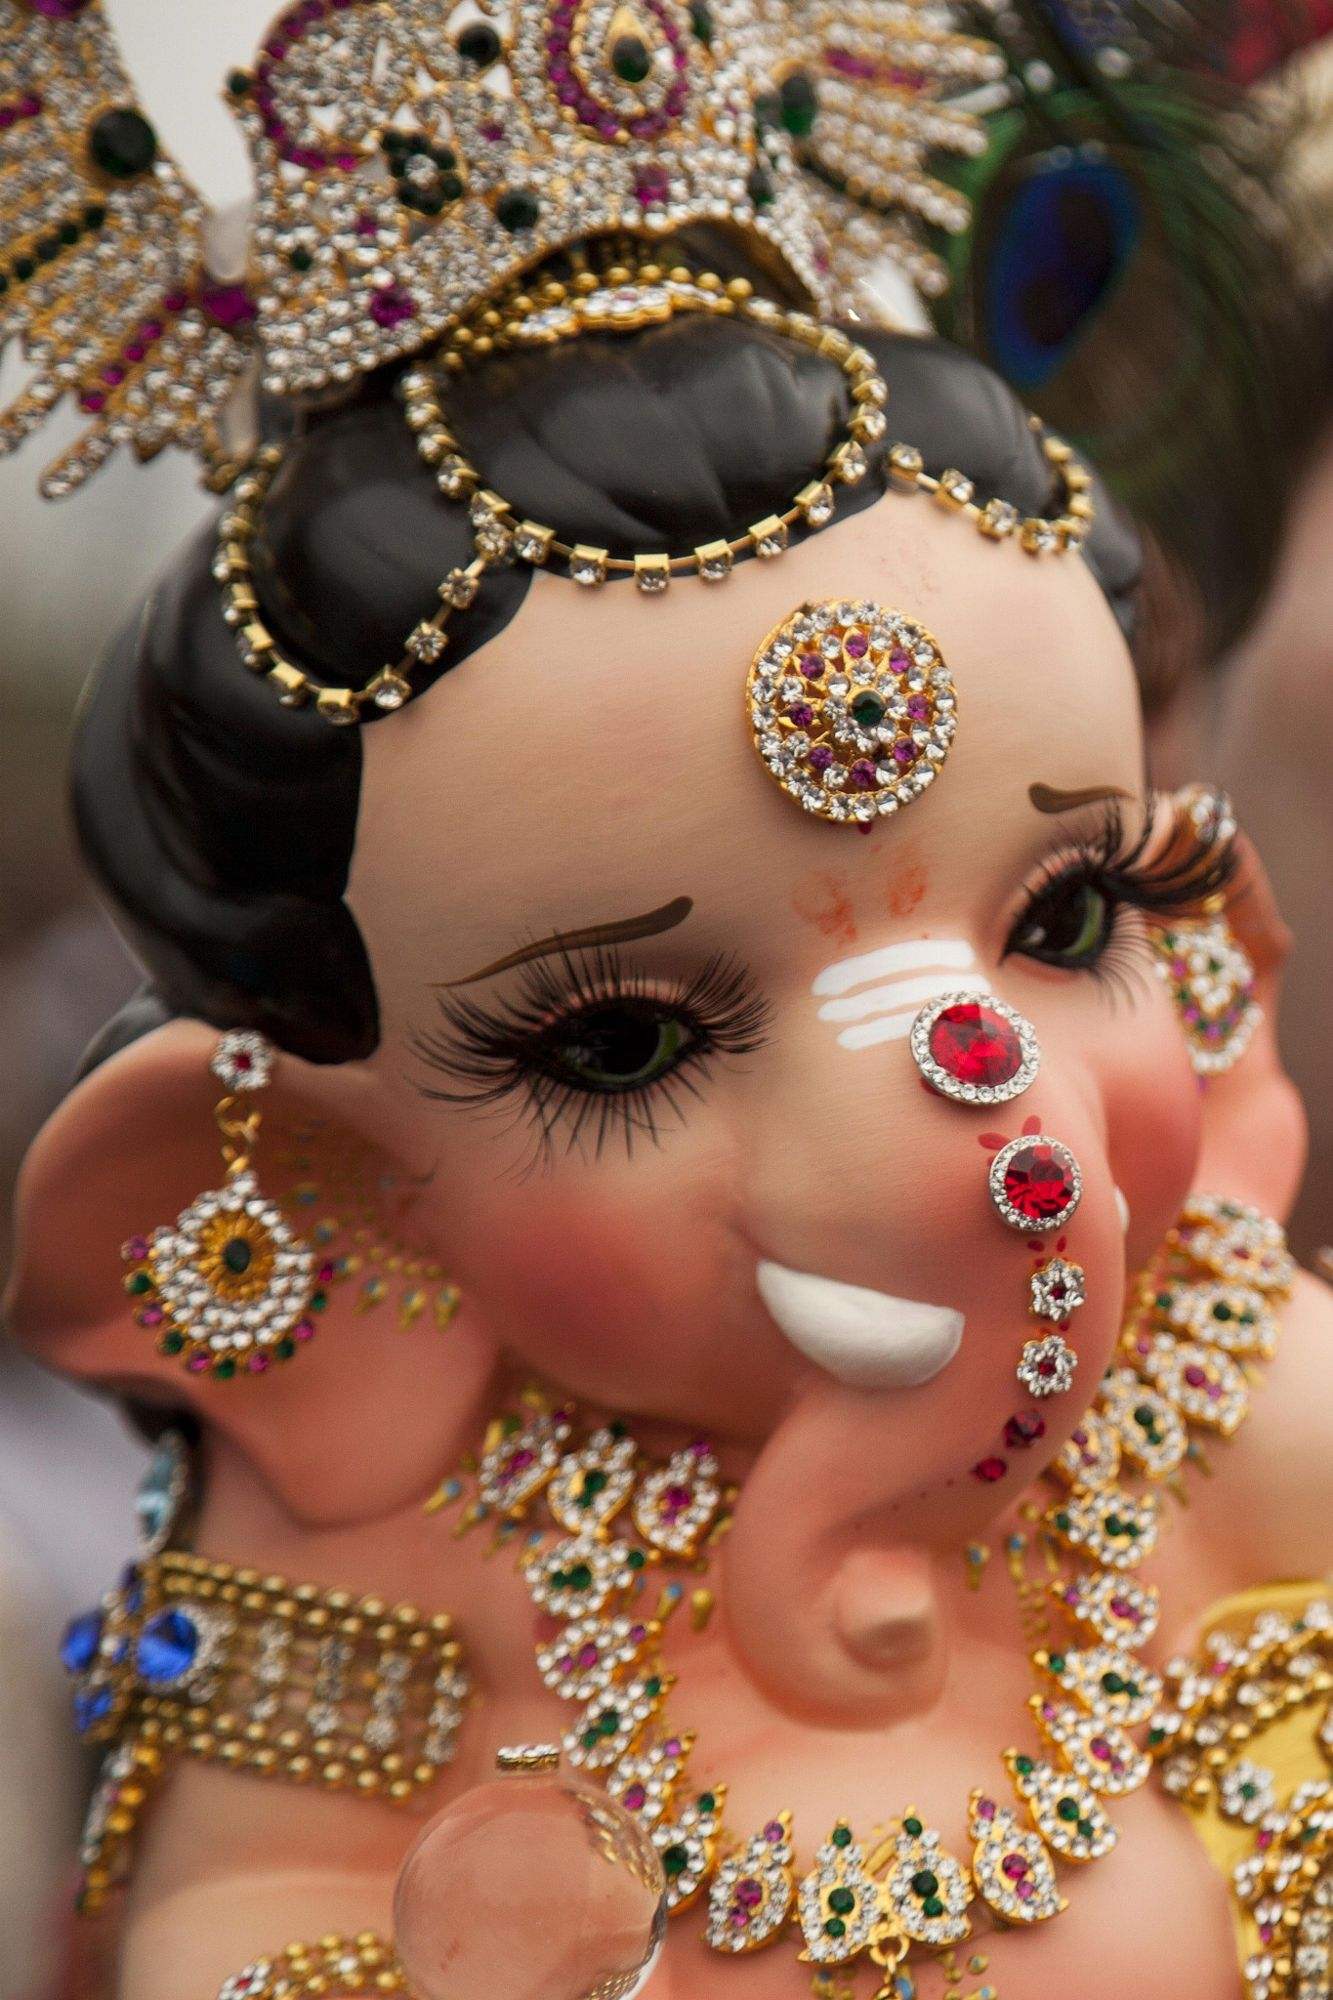 Cute Ganesha Baby Ganesha Happy Ganesh Chaturthi Ganesh Chaturthi Images